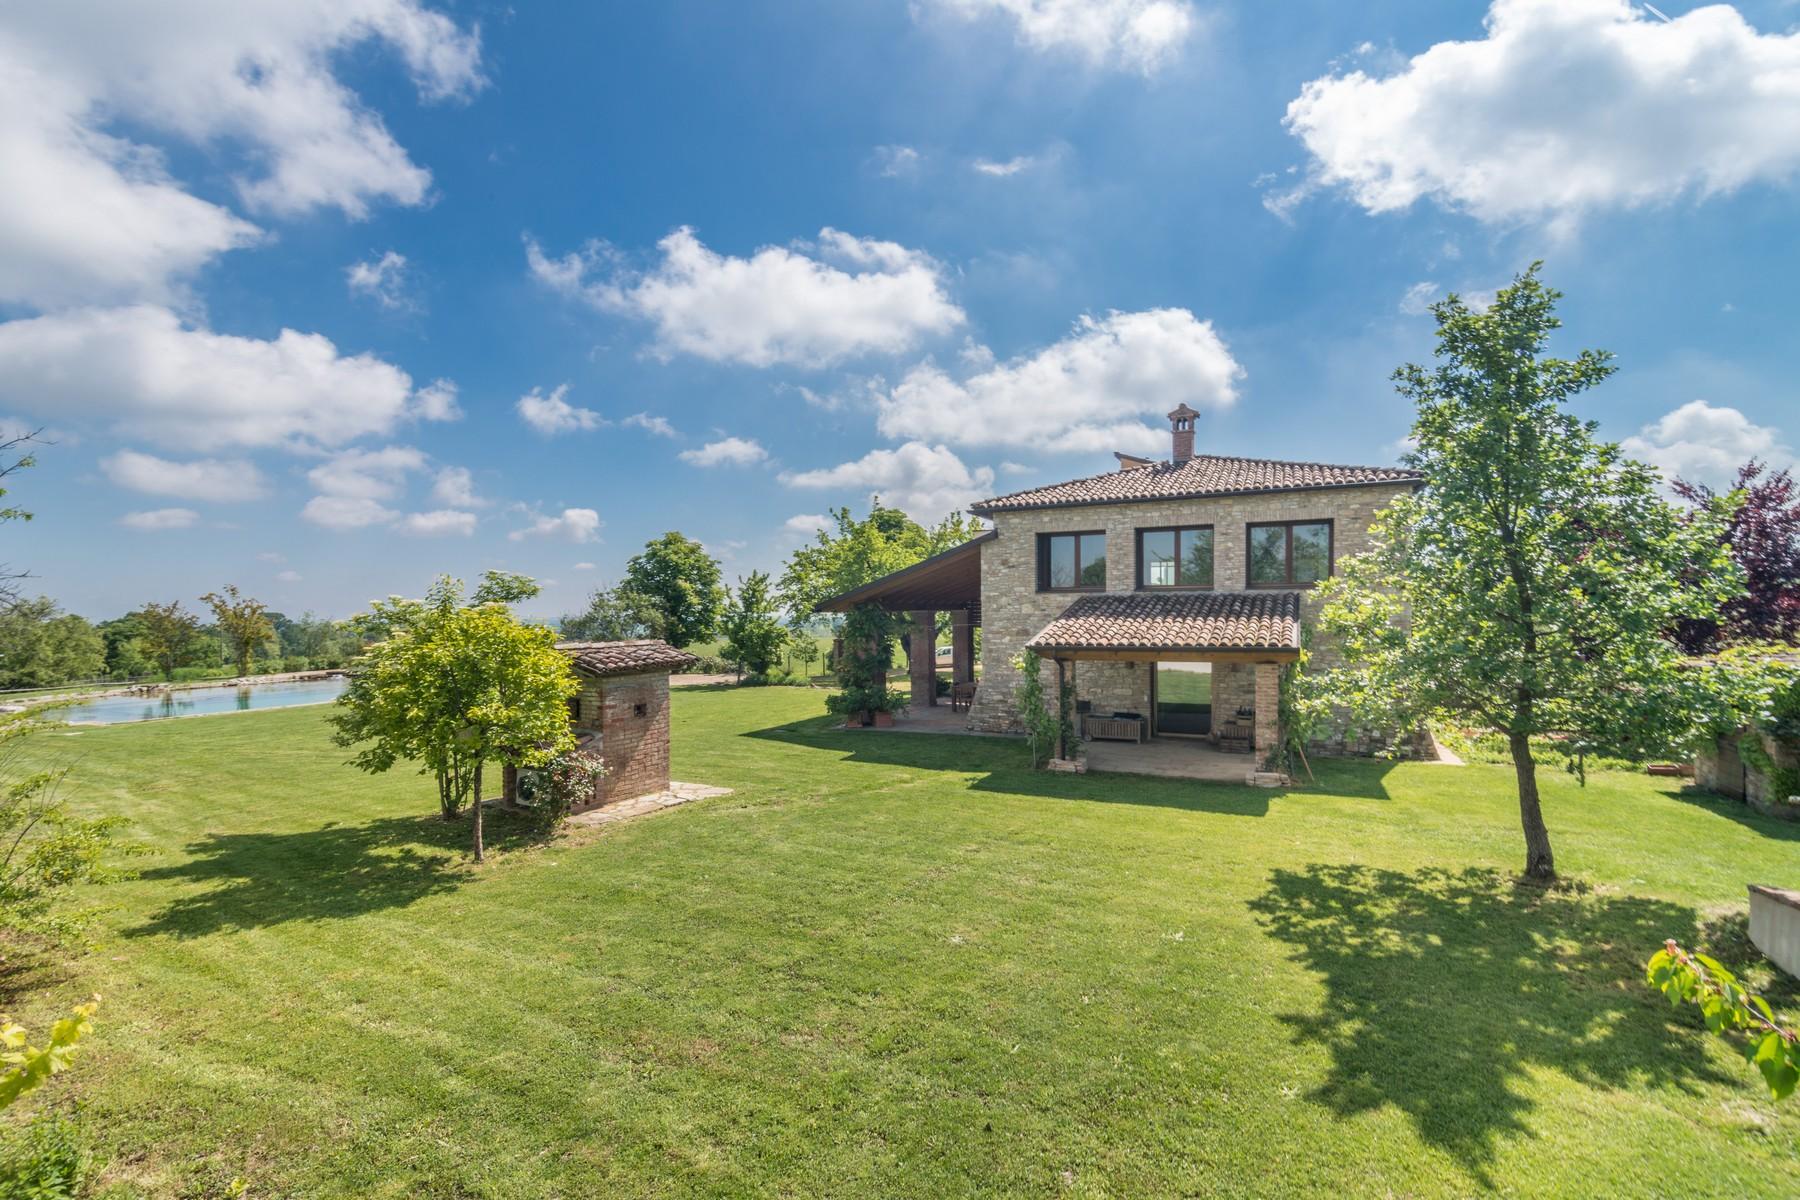 Villa in Vendita a Piacenza: 5 locali, 800 mq - Foto 5